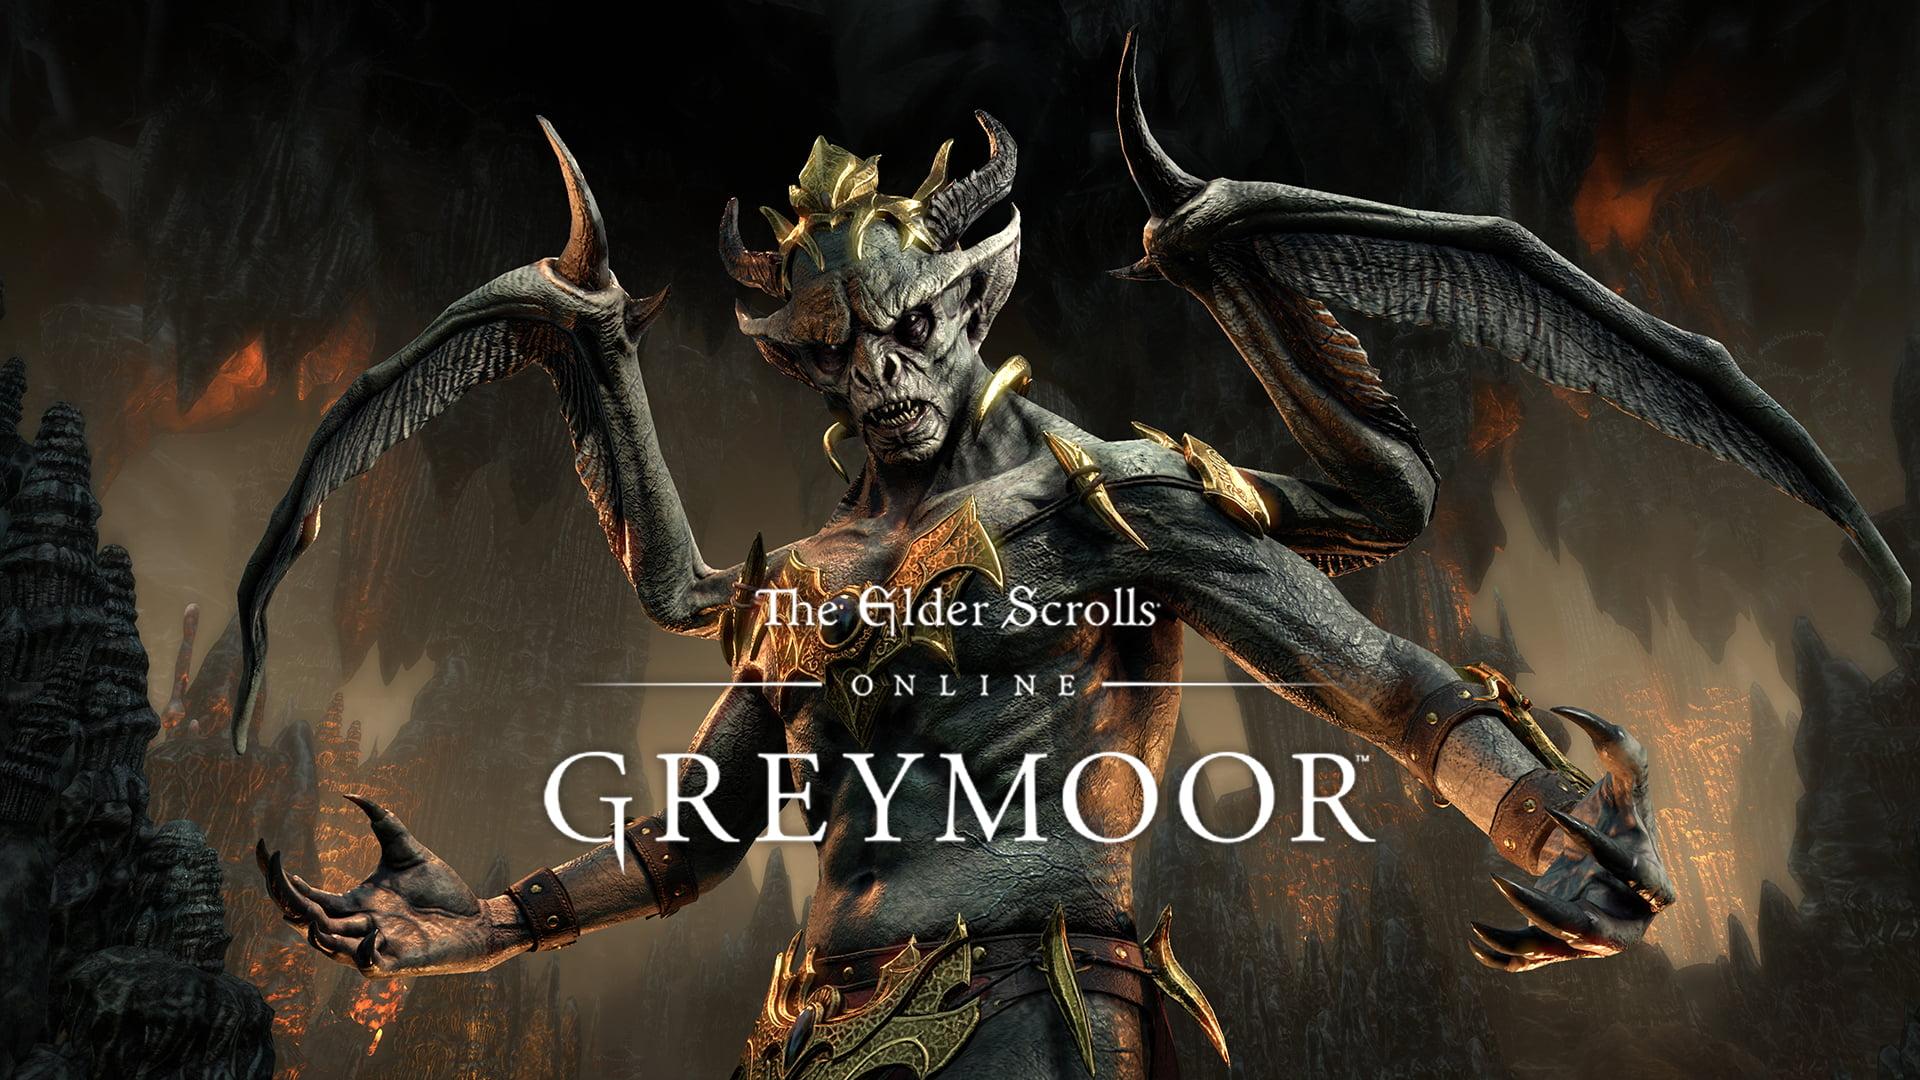 The Elder Scrolls Online - Greymoor Steam Gift